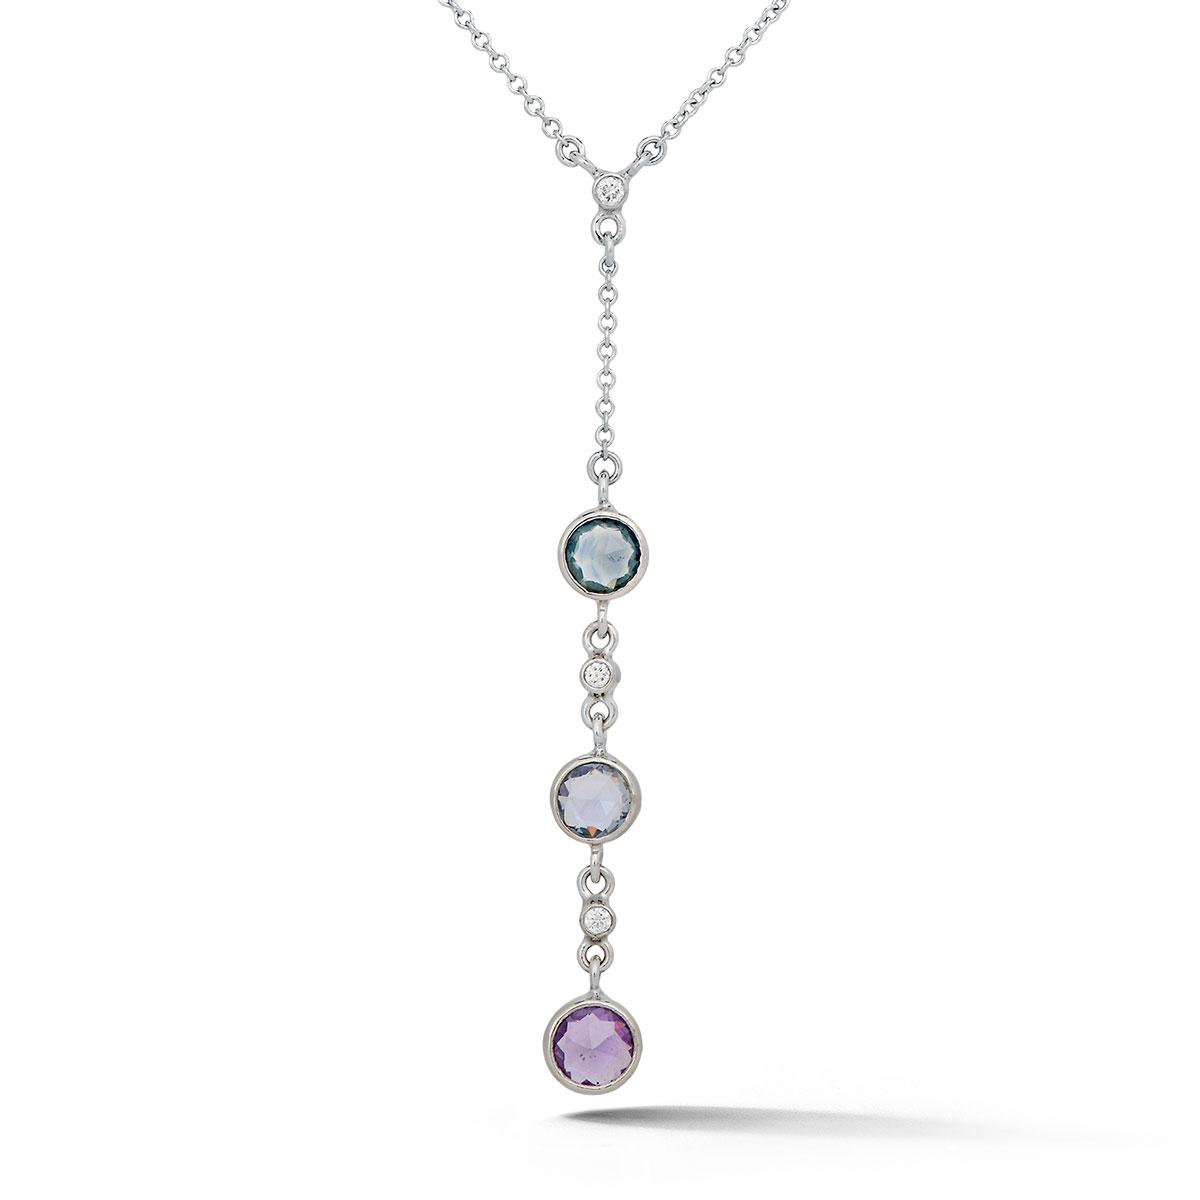 NP0198 Triple Sapphire Pendant